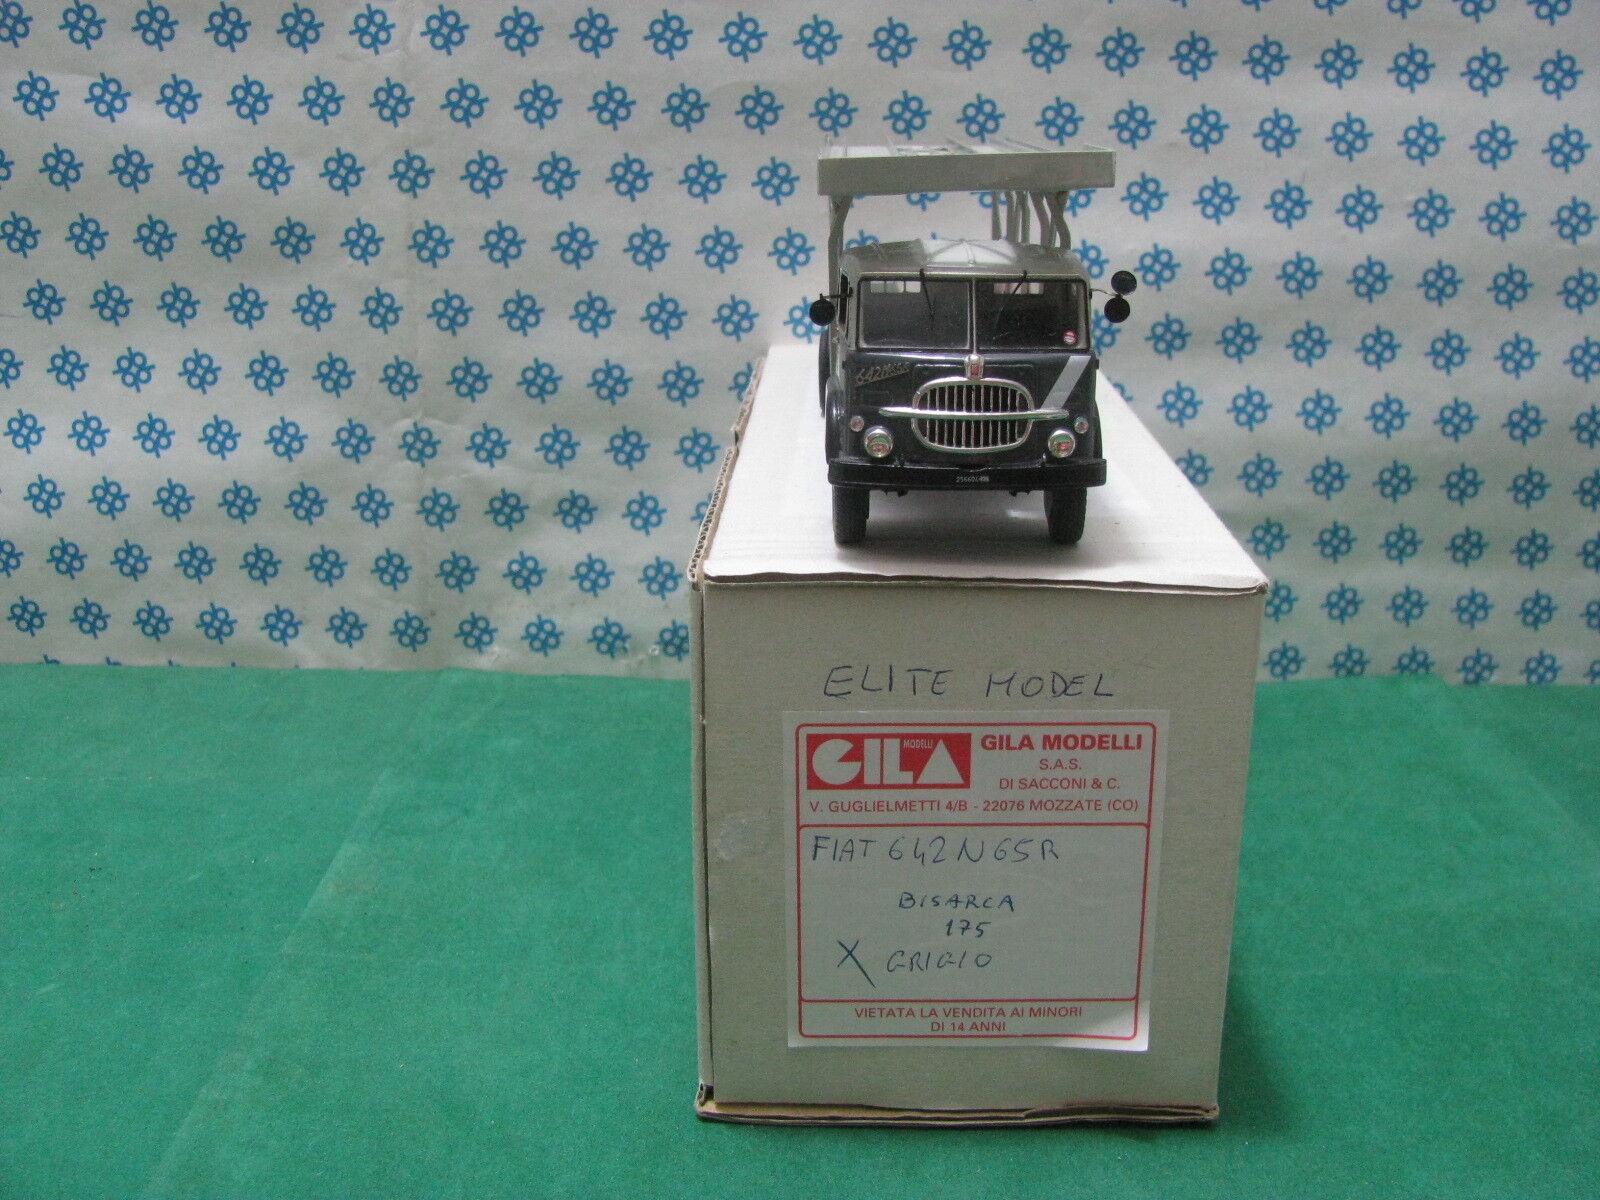 FIAT 642 N65R  Bisarca Porta auto  2 assi   - 1 43 Gila Modelli (Elite Models)